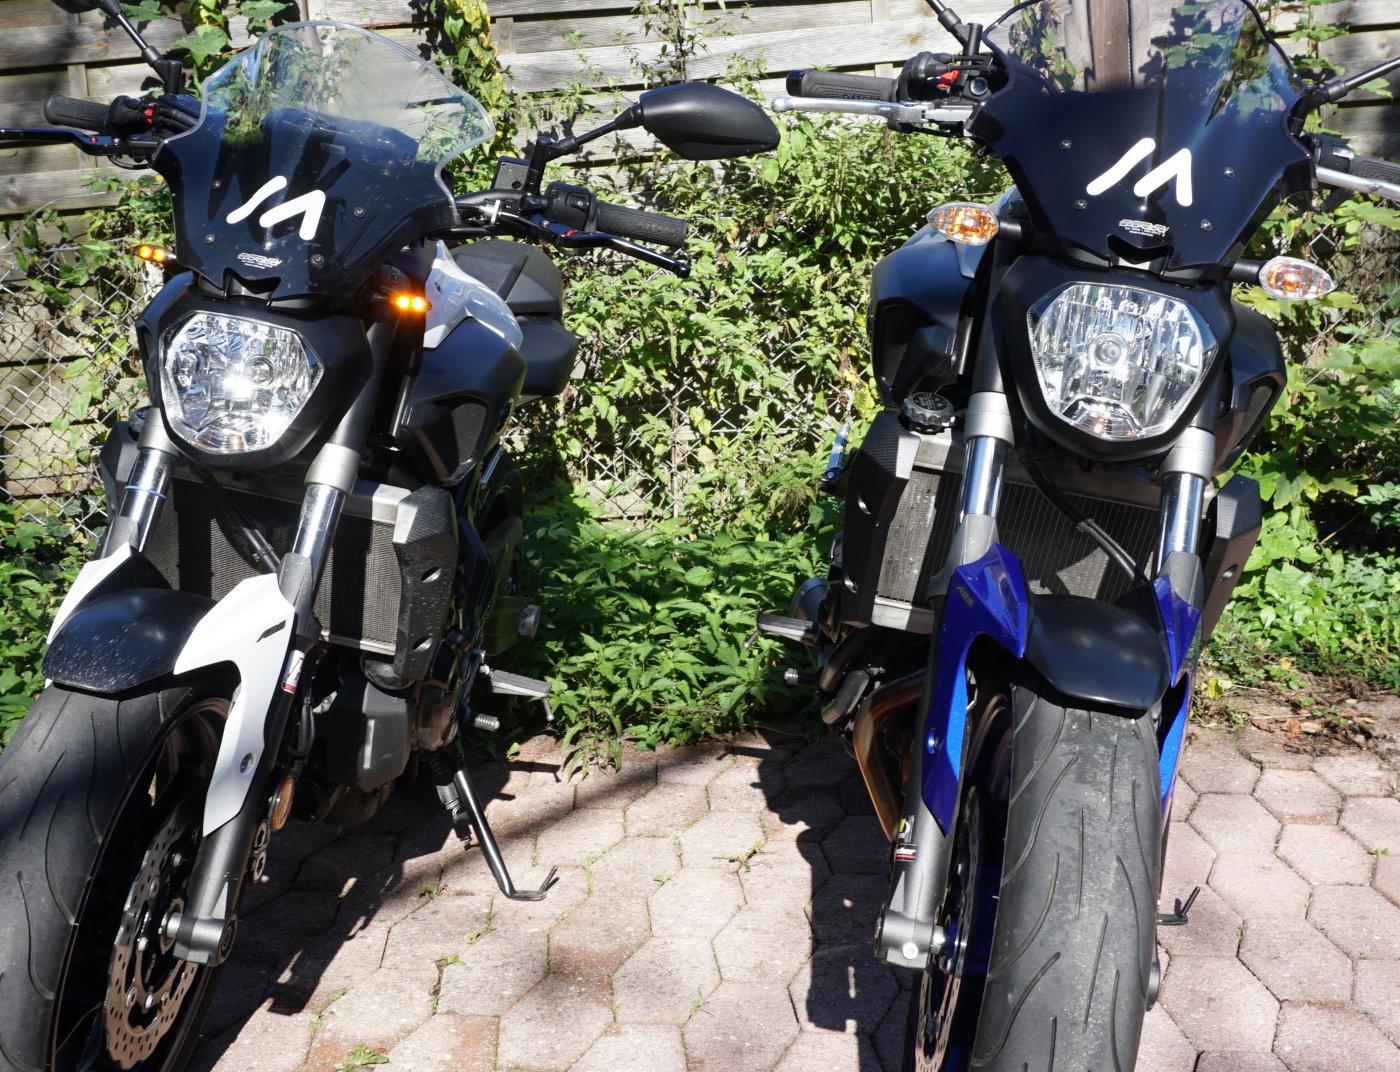 Vergleich Serienblinker vs. Kellermann Micro 1000 Dark an Yamaha MT-07 - direktes Sonnenlicht